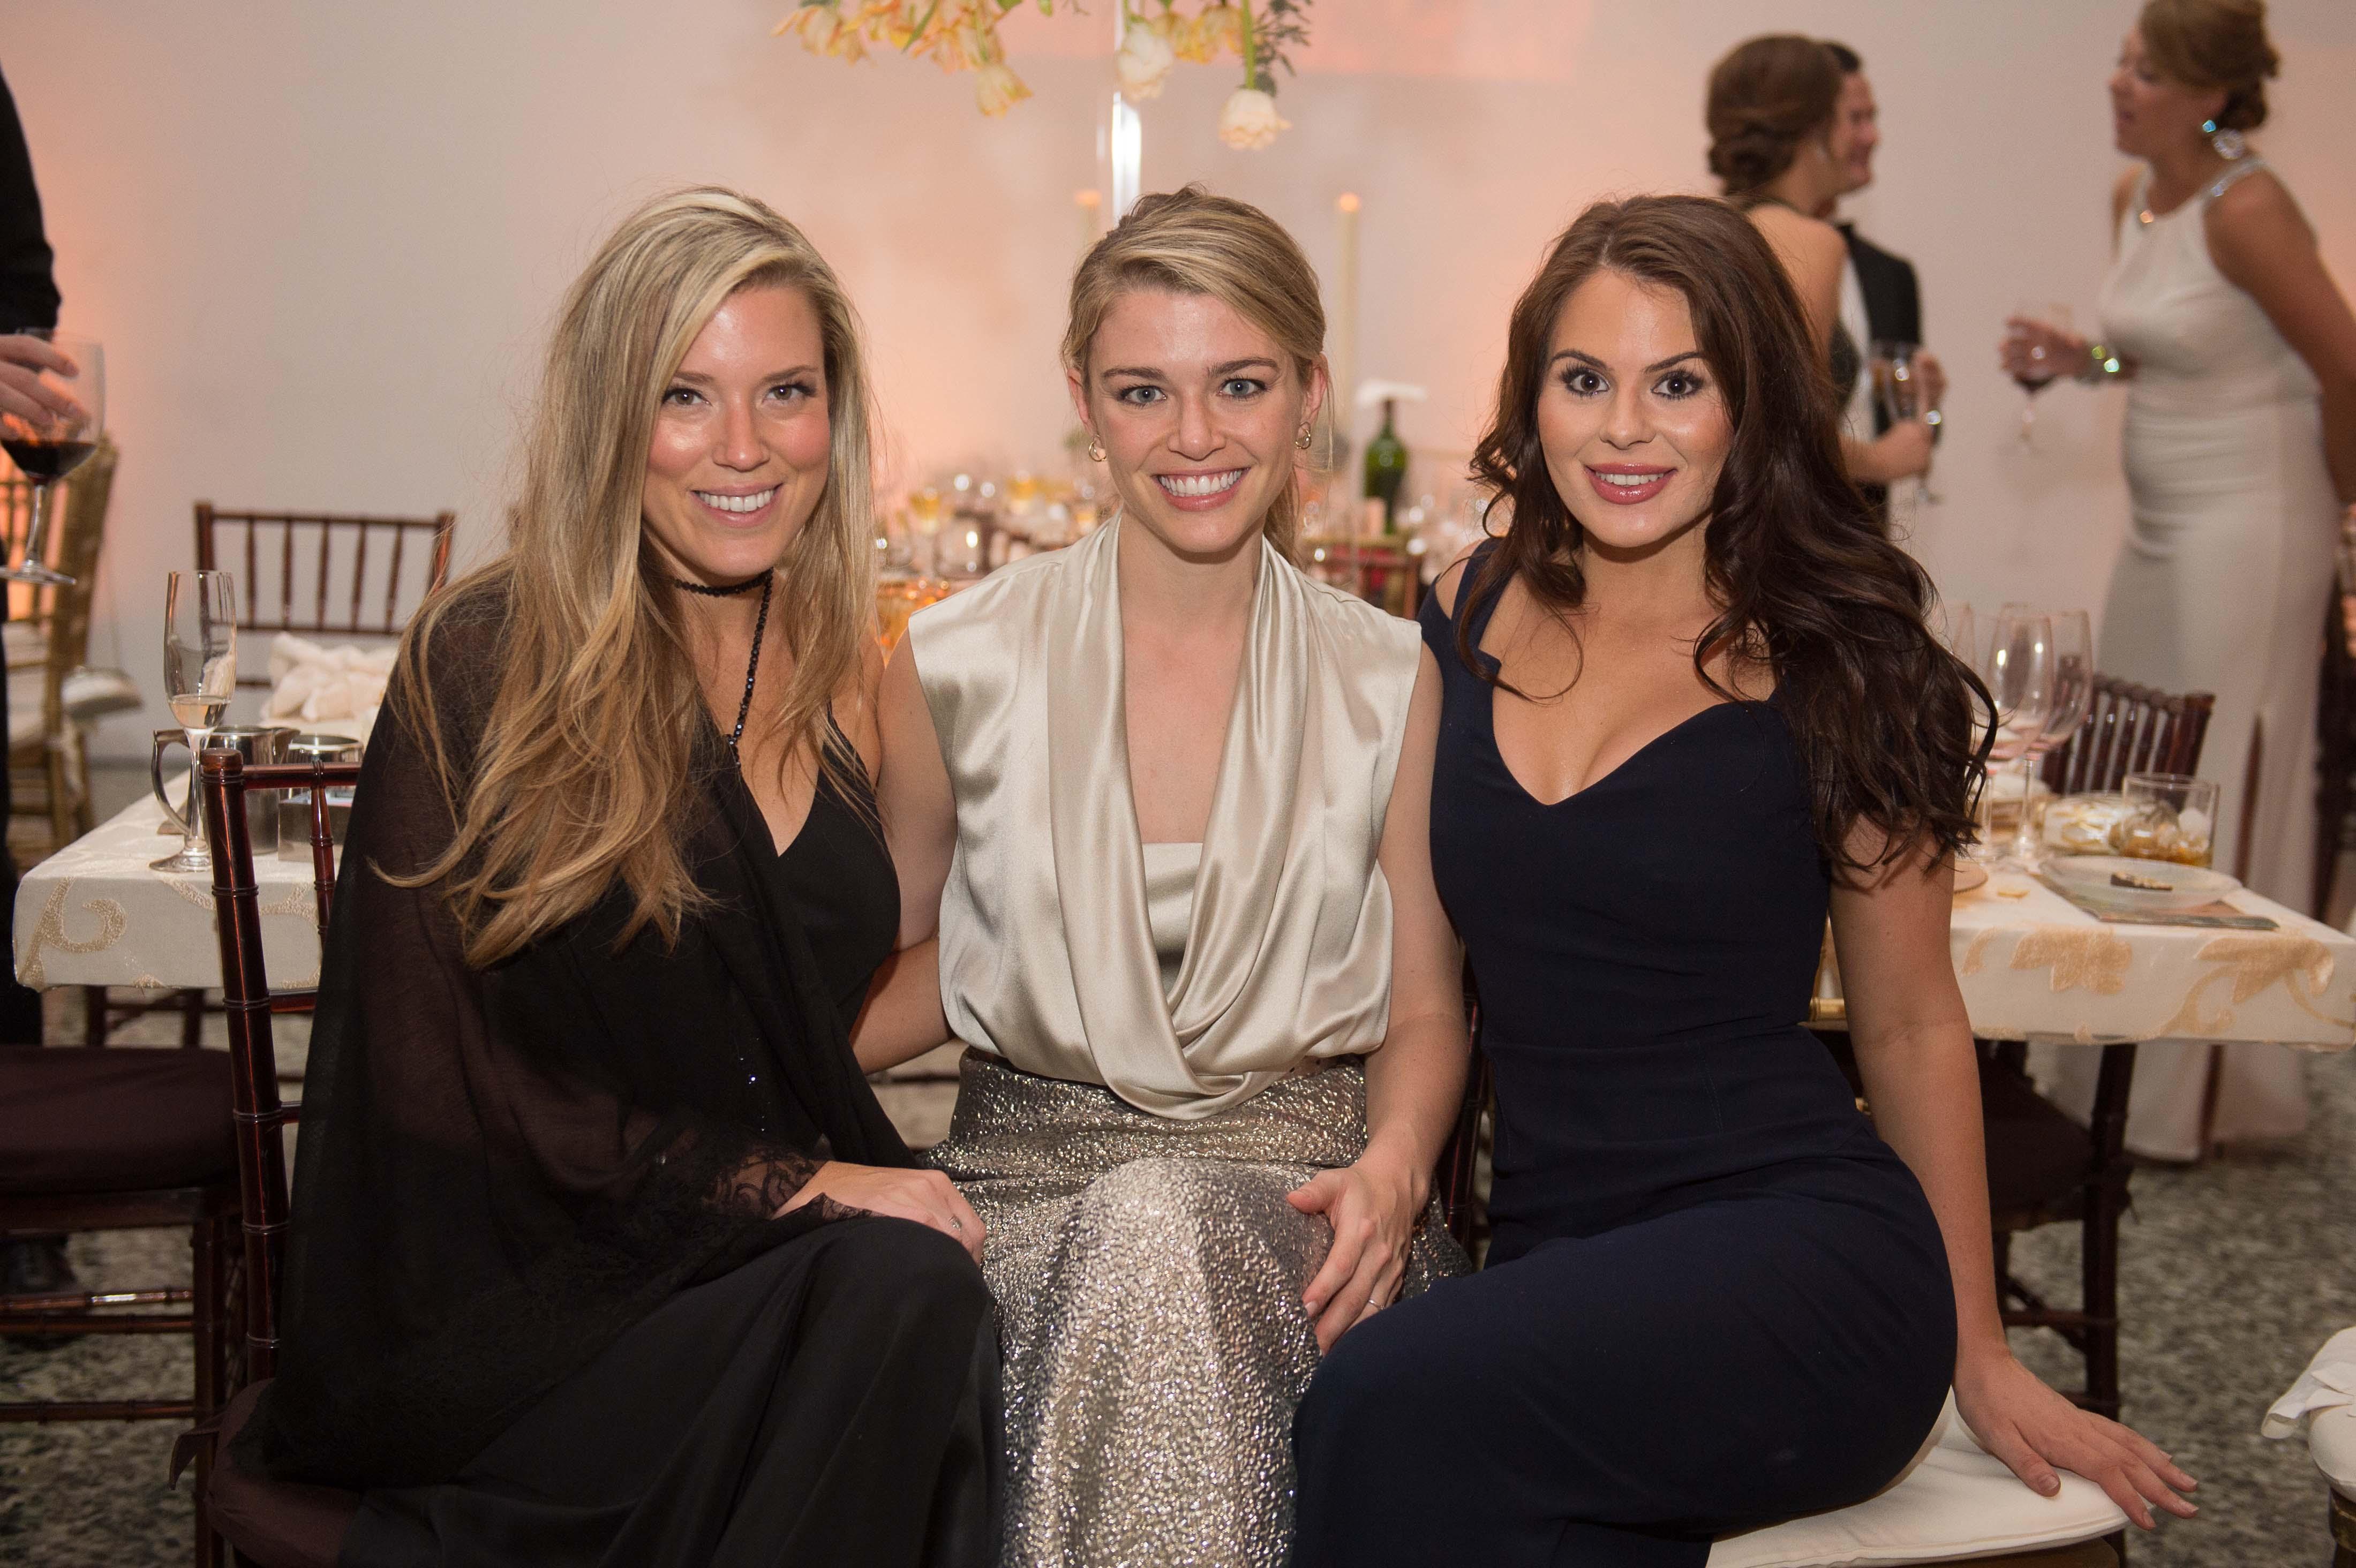 Holly Alvis; Brittany Sakowitz; Meredith Flores; Photo by Wilson Parish